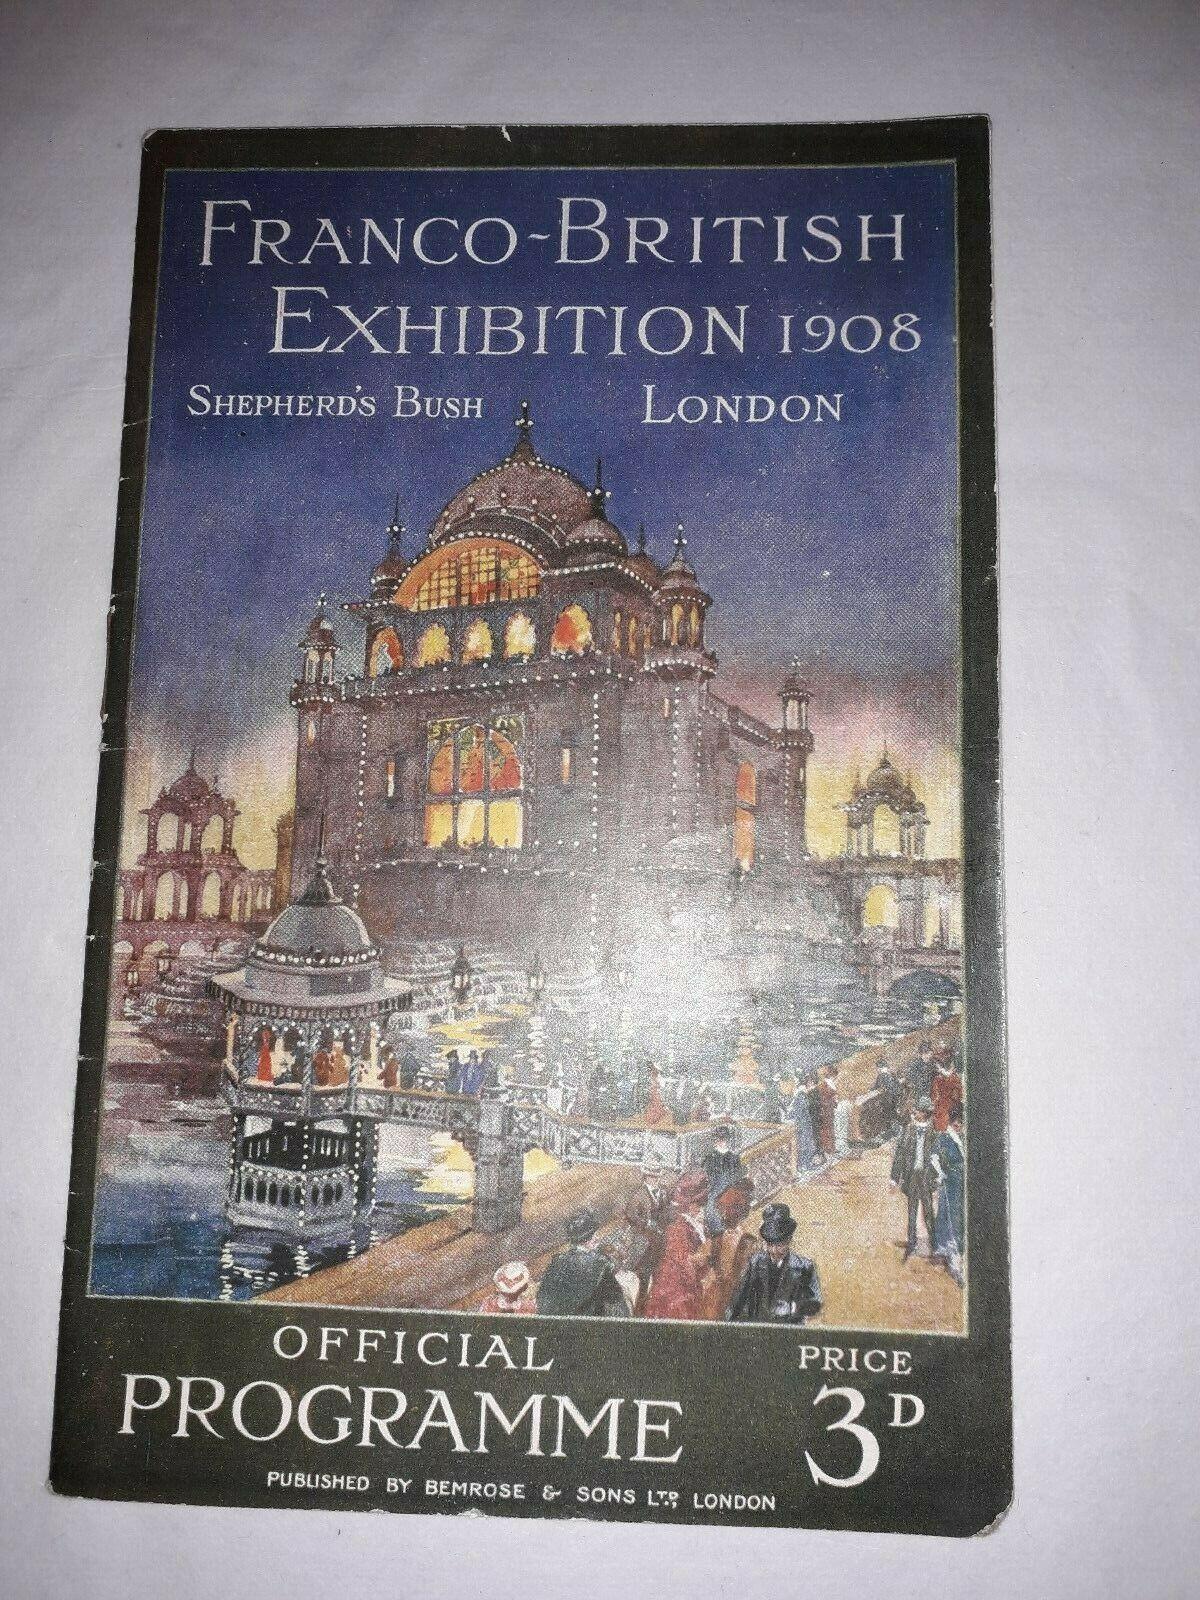 FrancoBritish Exhibition 1908 Original Official Programme